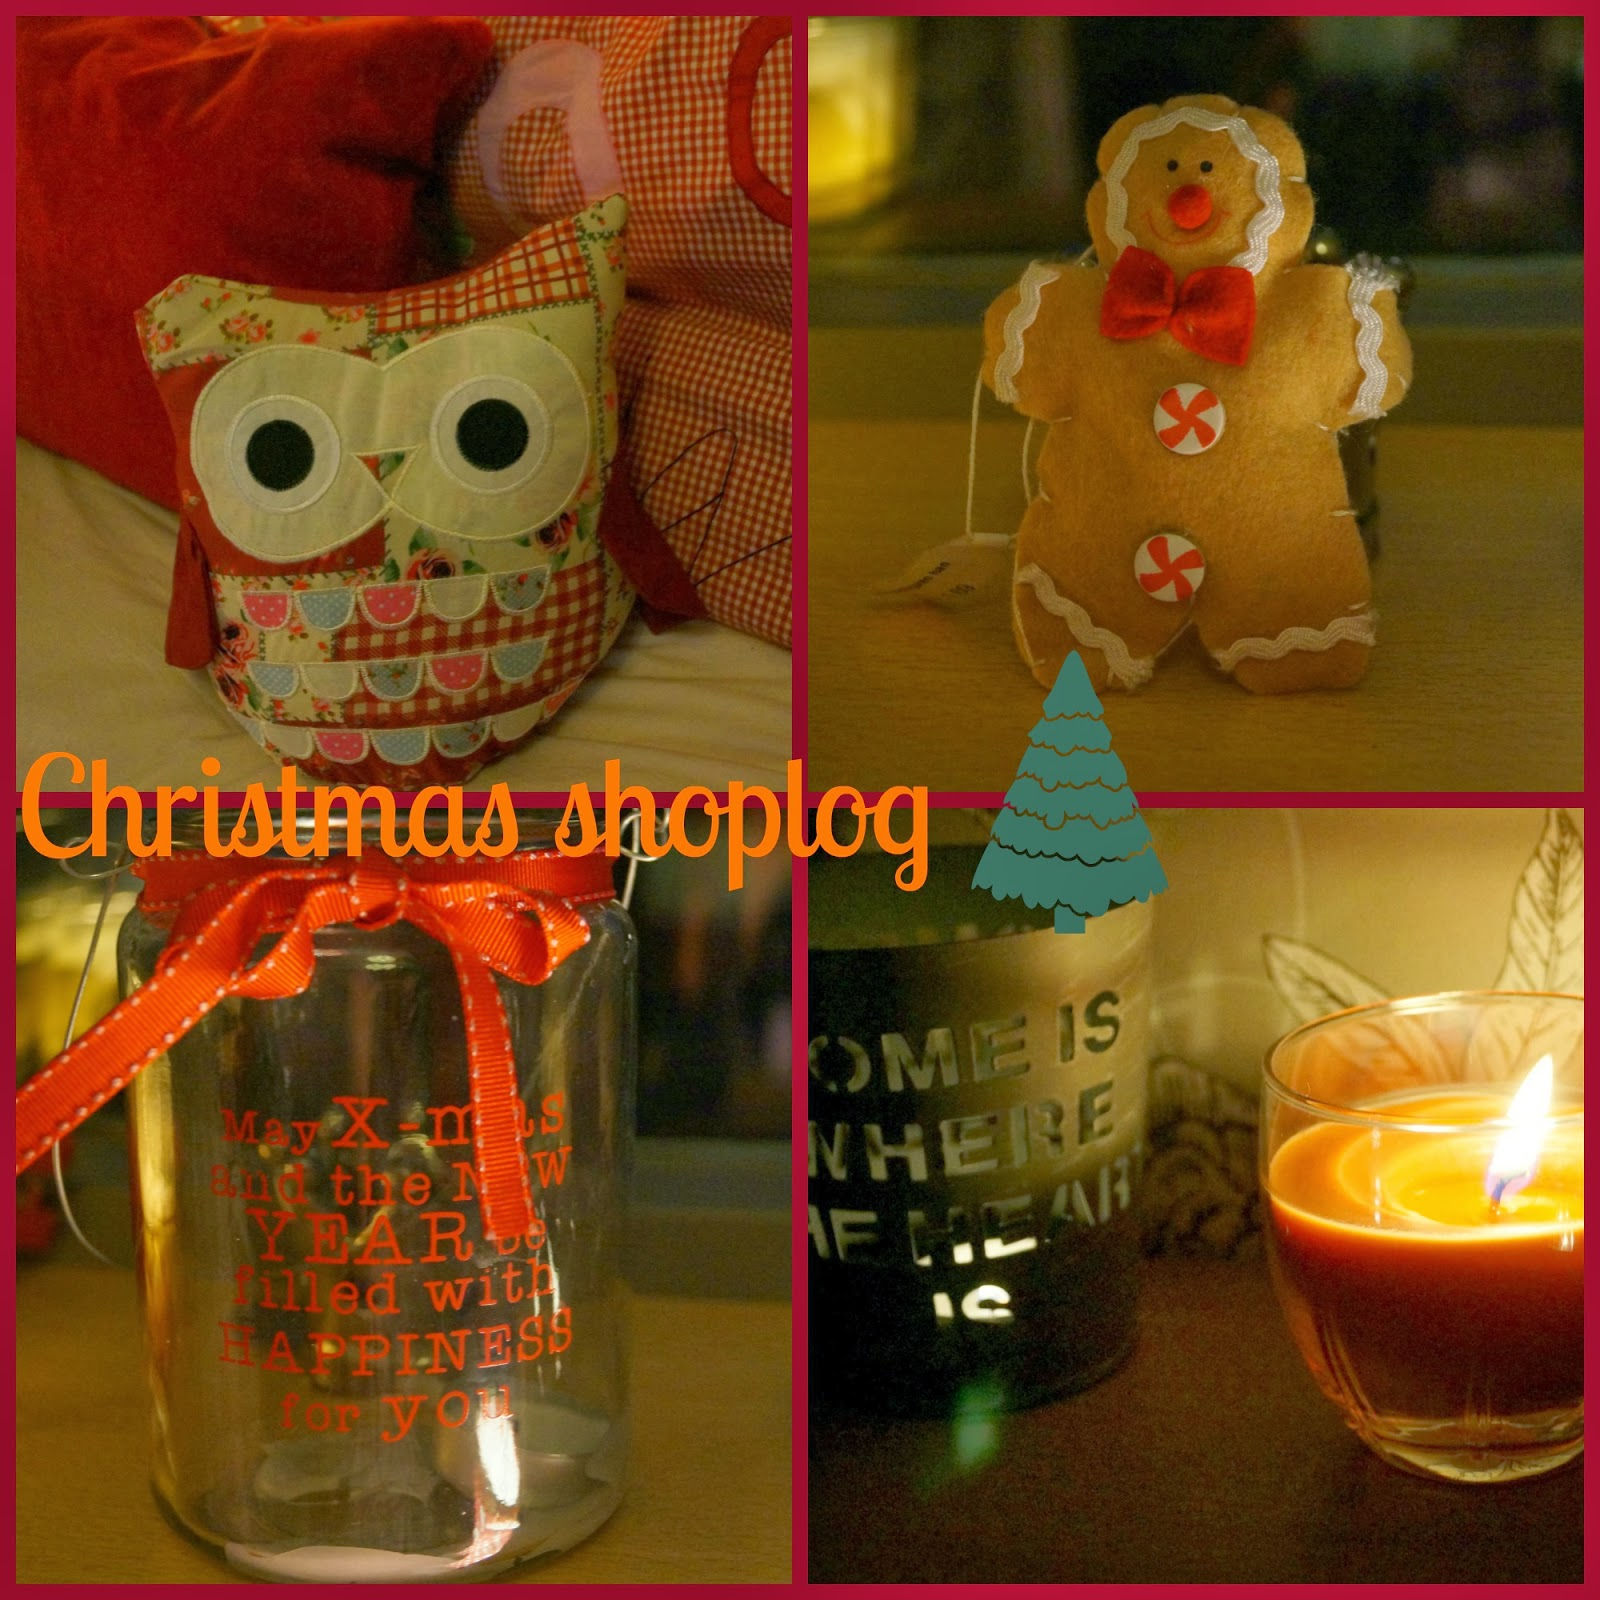 Shoplog; christmas shopping! Let it snow #4